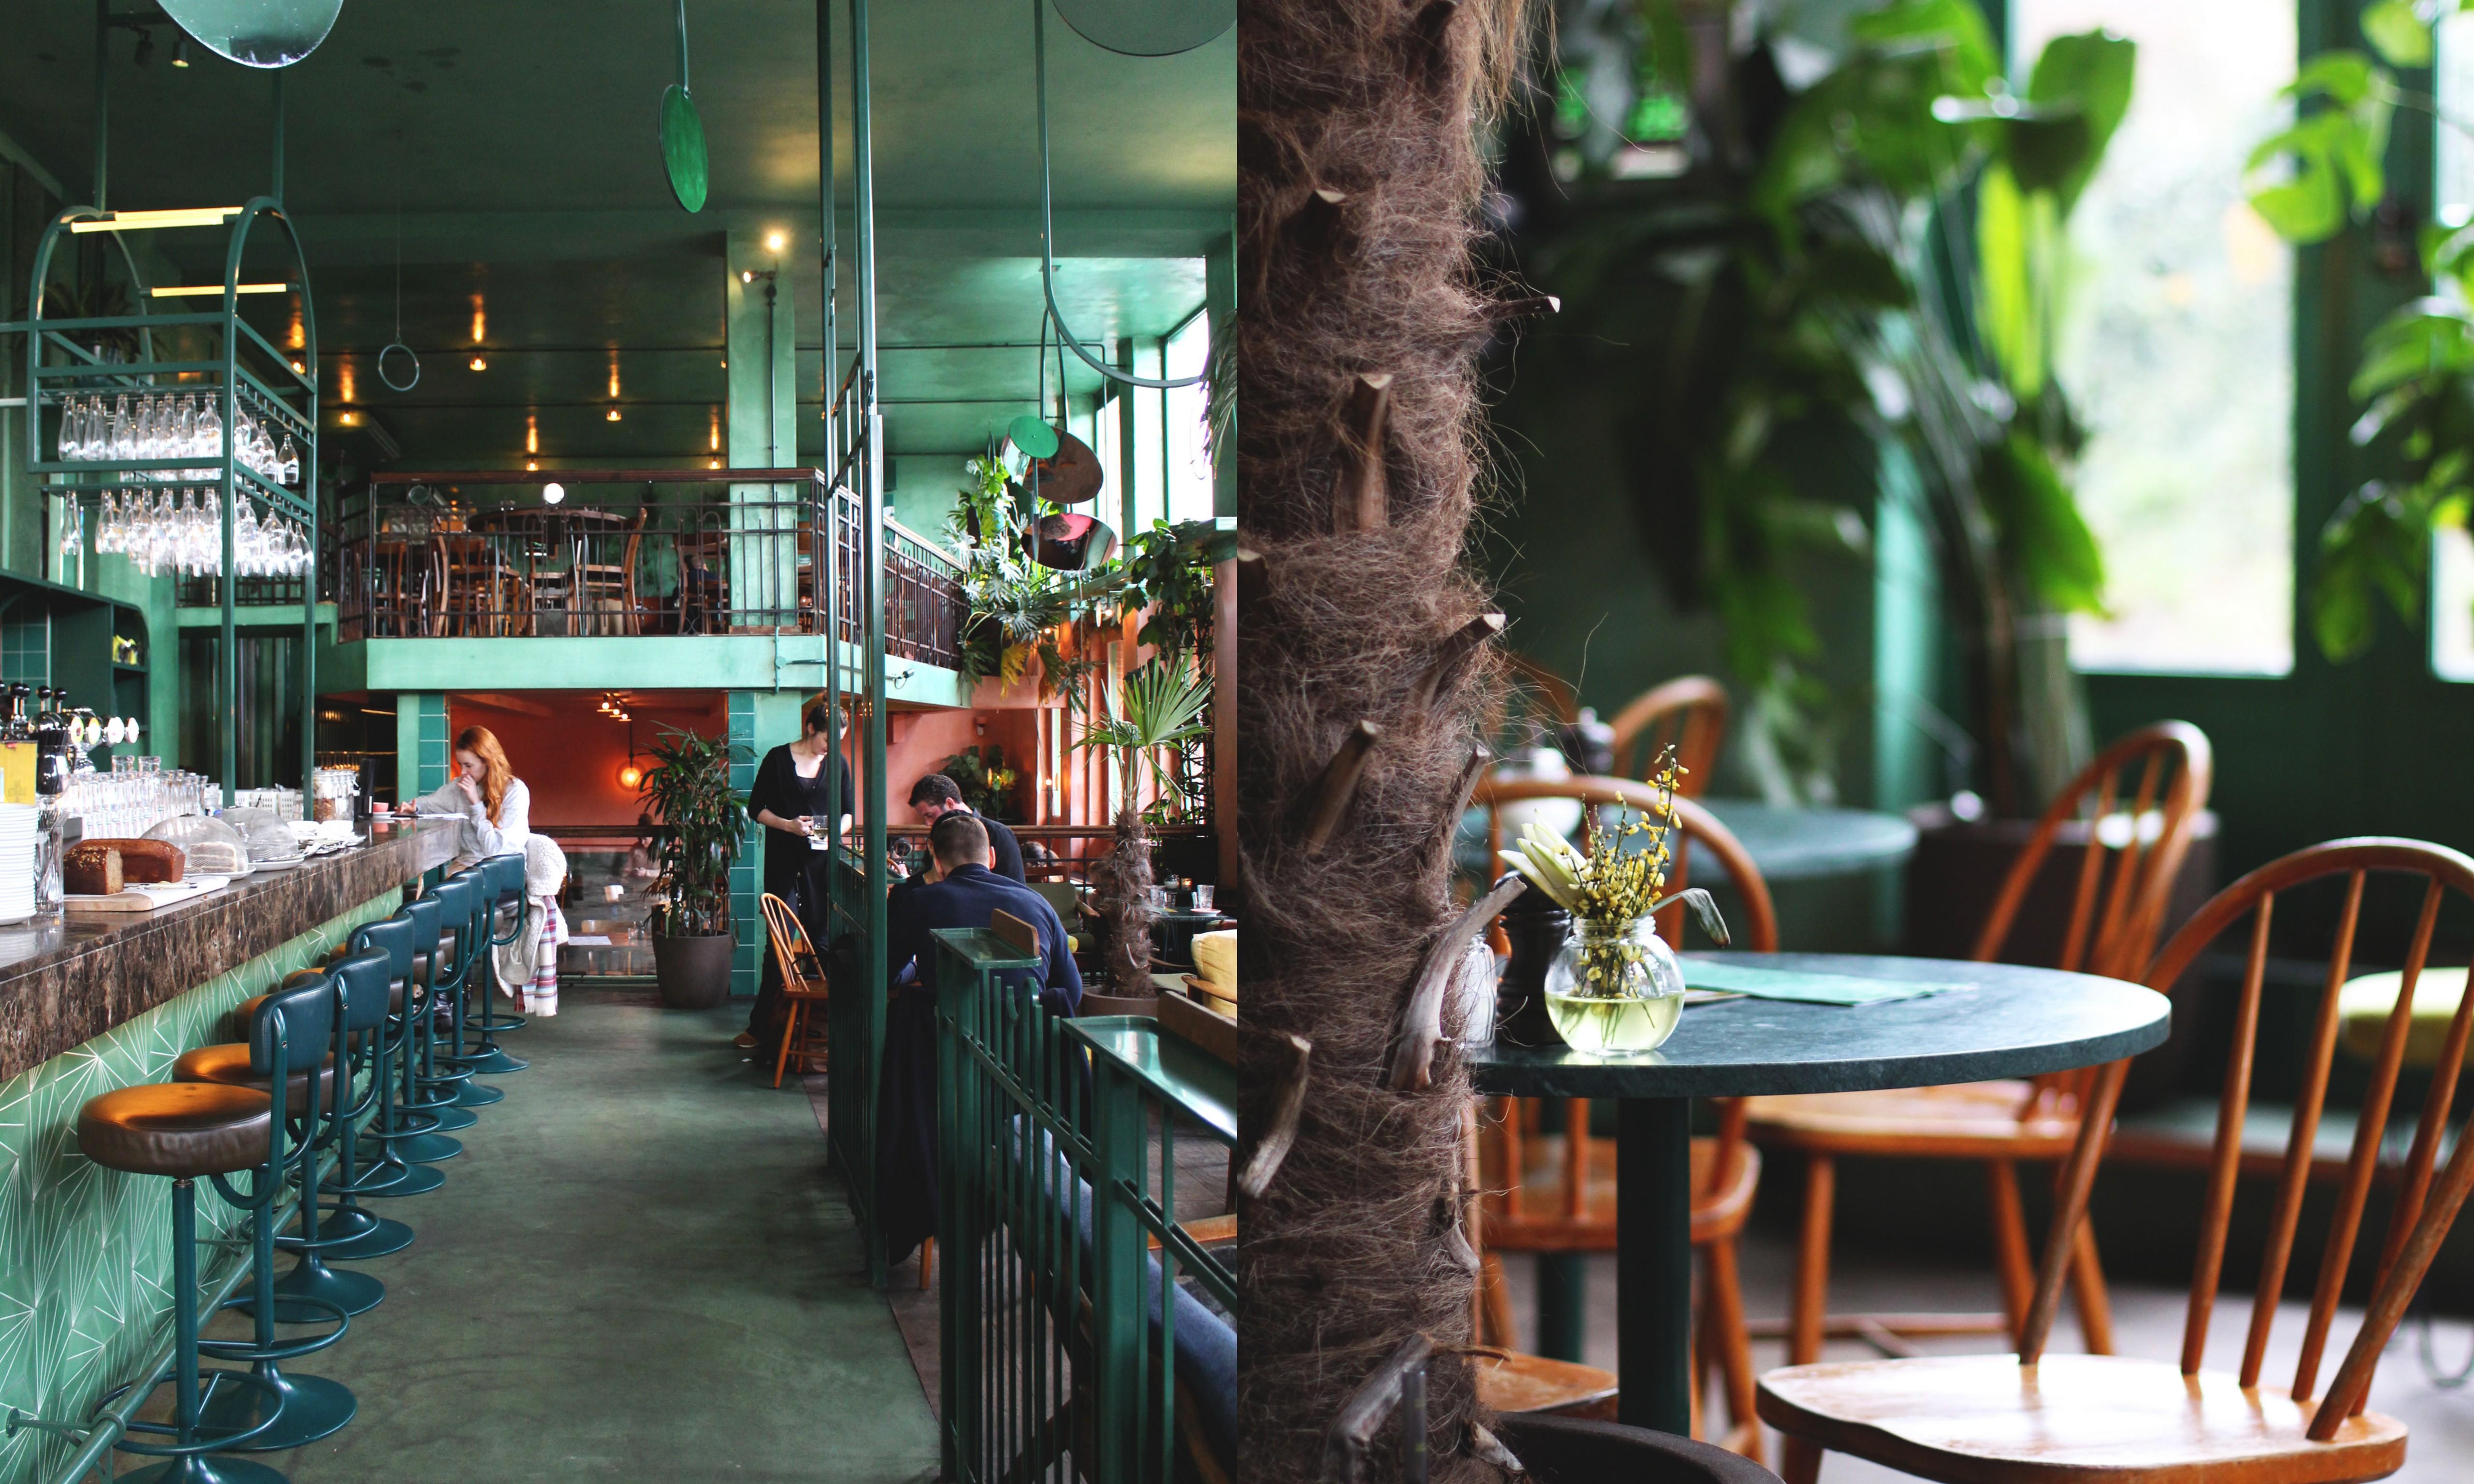 Hotspot Bar Botanique in Amsterdam